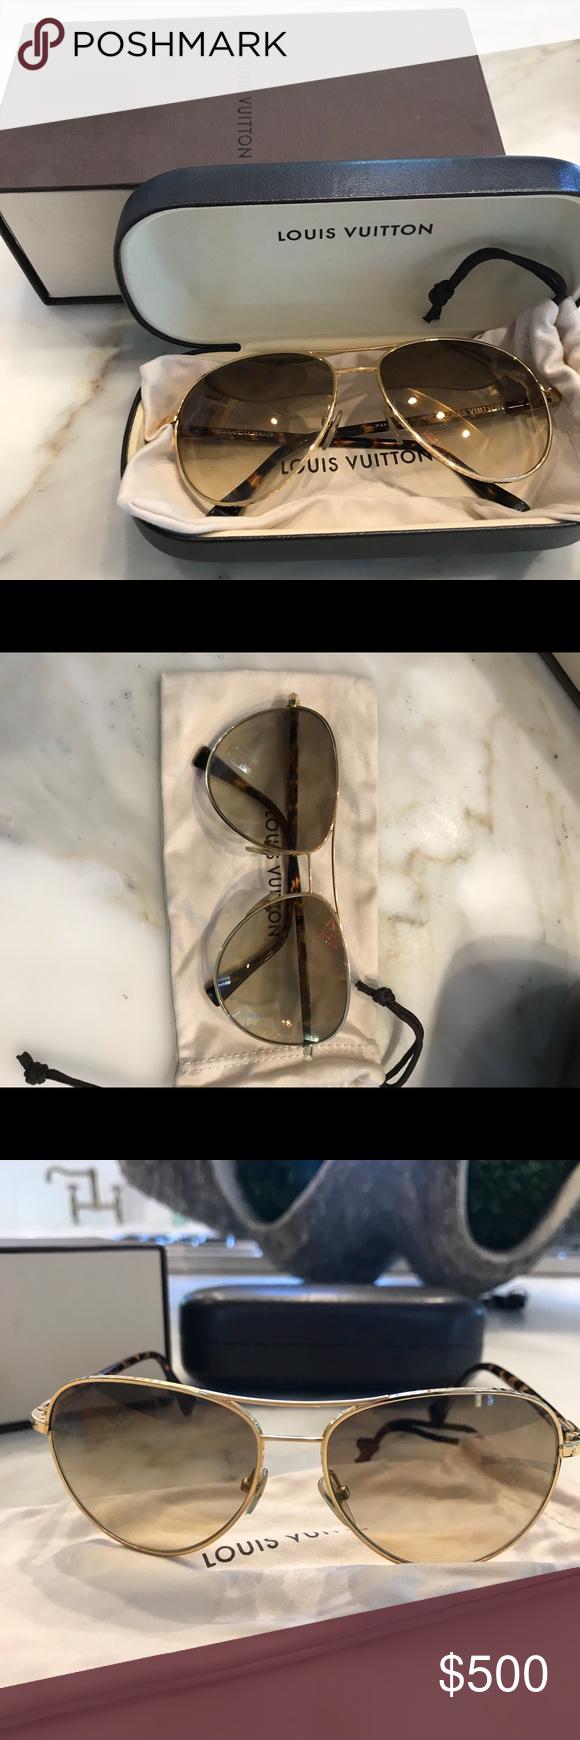 edb5ef88b06a Louis Vuitton Aviator Sunglasses Gently used LV aviators! No scratches